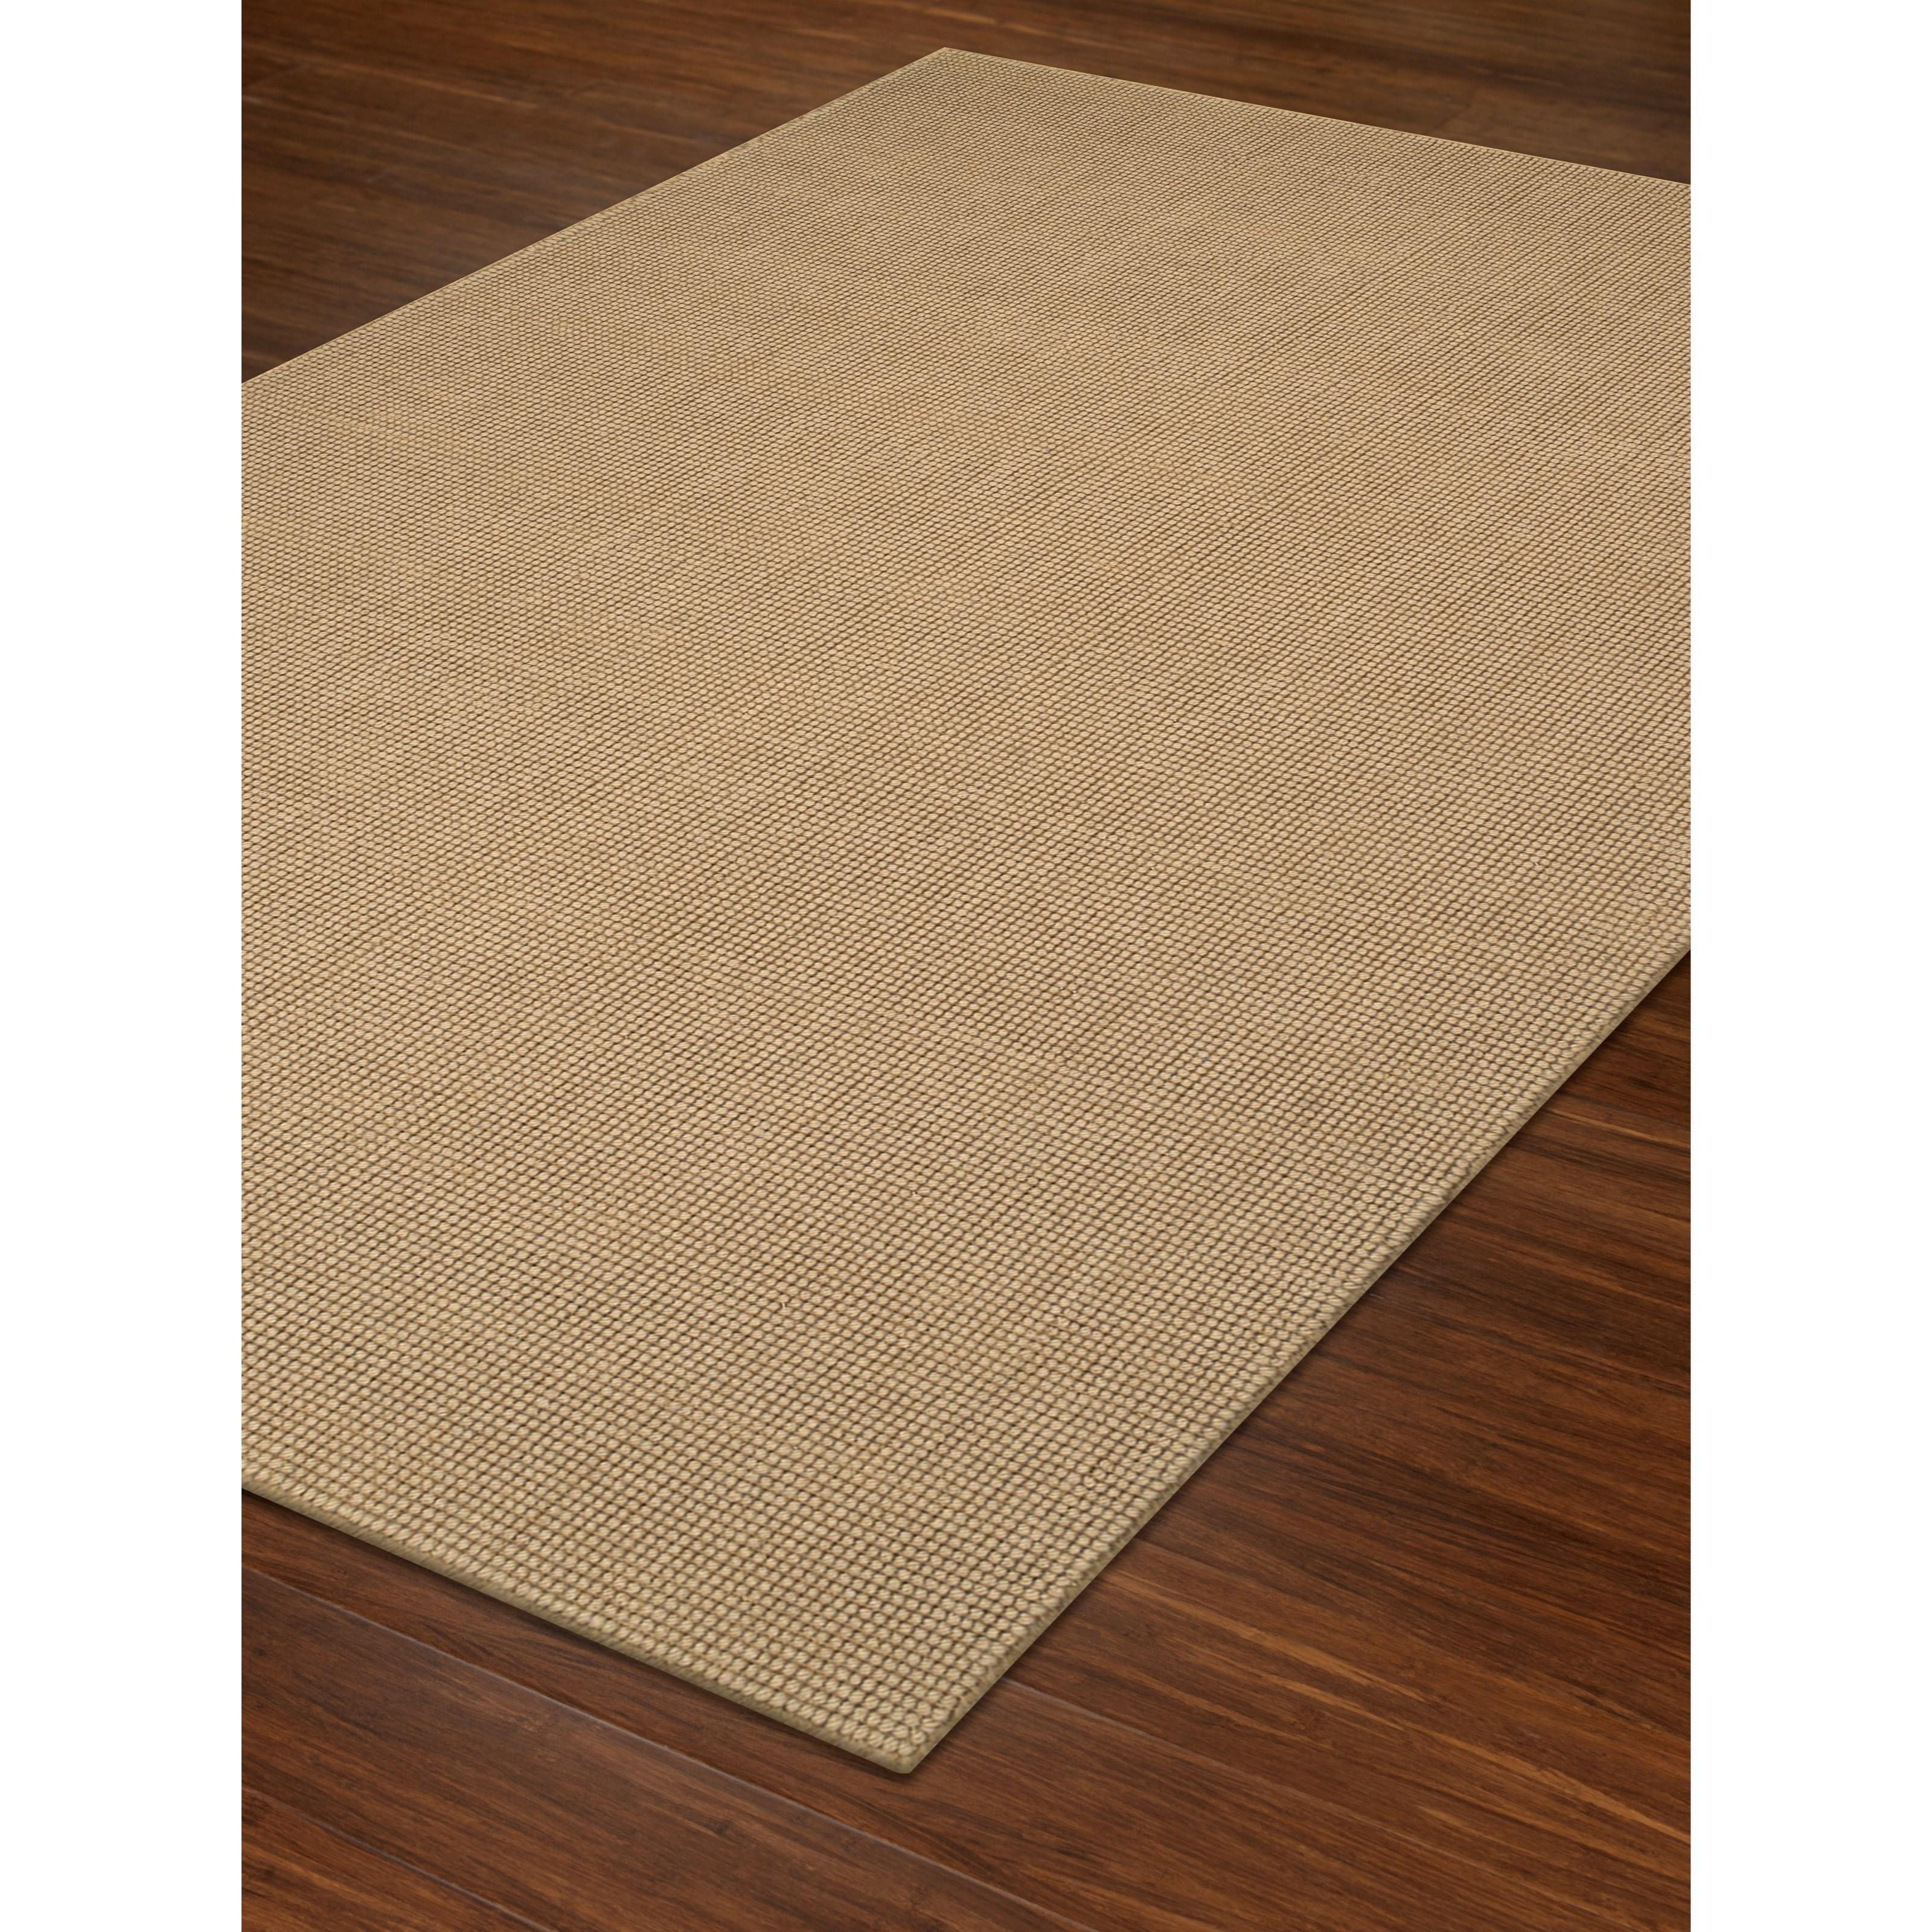 "Monaco Sisal Wheat 2'3"" x 8' Rug by Dalyn at Fashion Furniture"